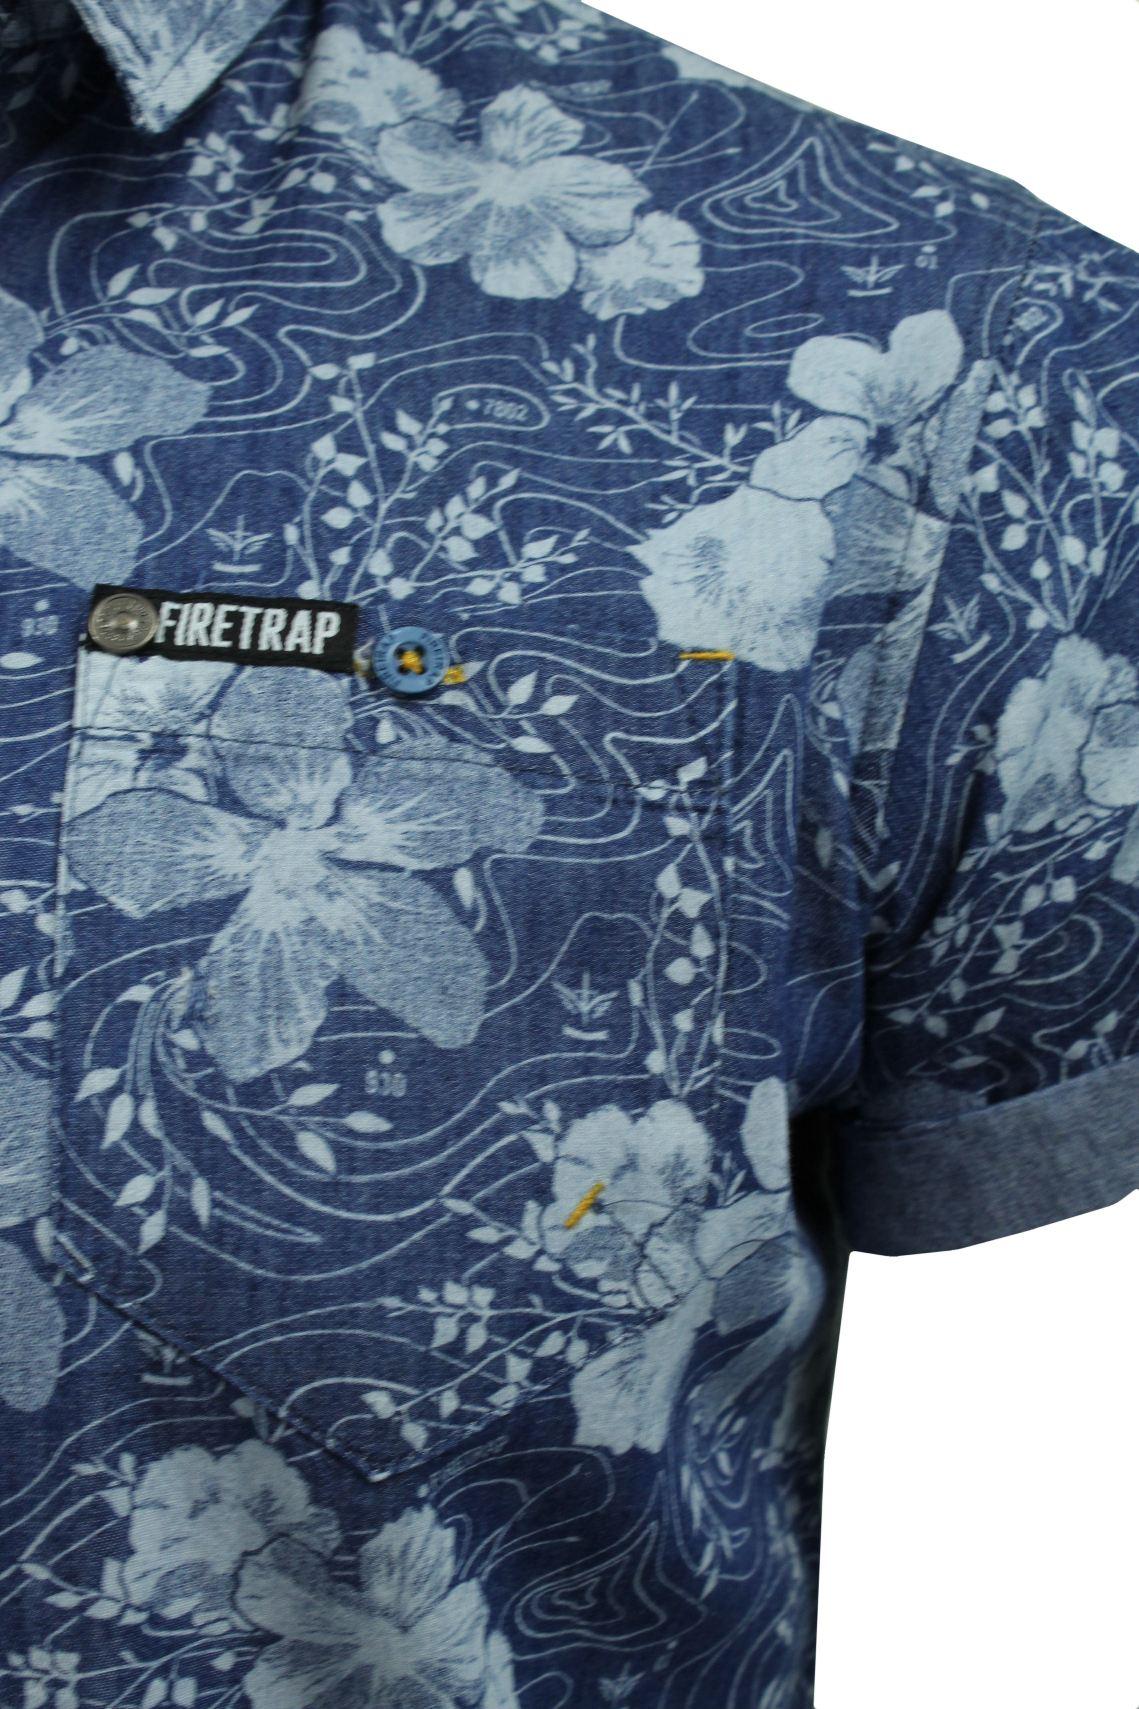 Mens-Short-Sleeved-Shirt-by-Firetrap thumbnail 31